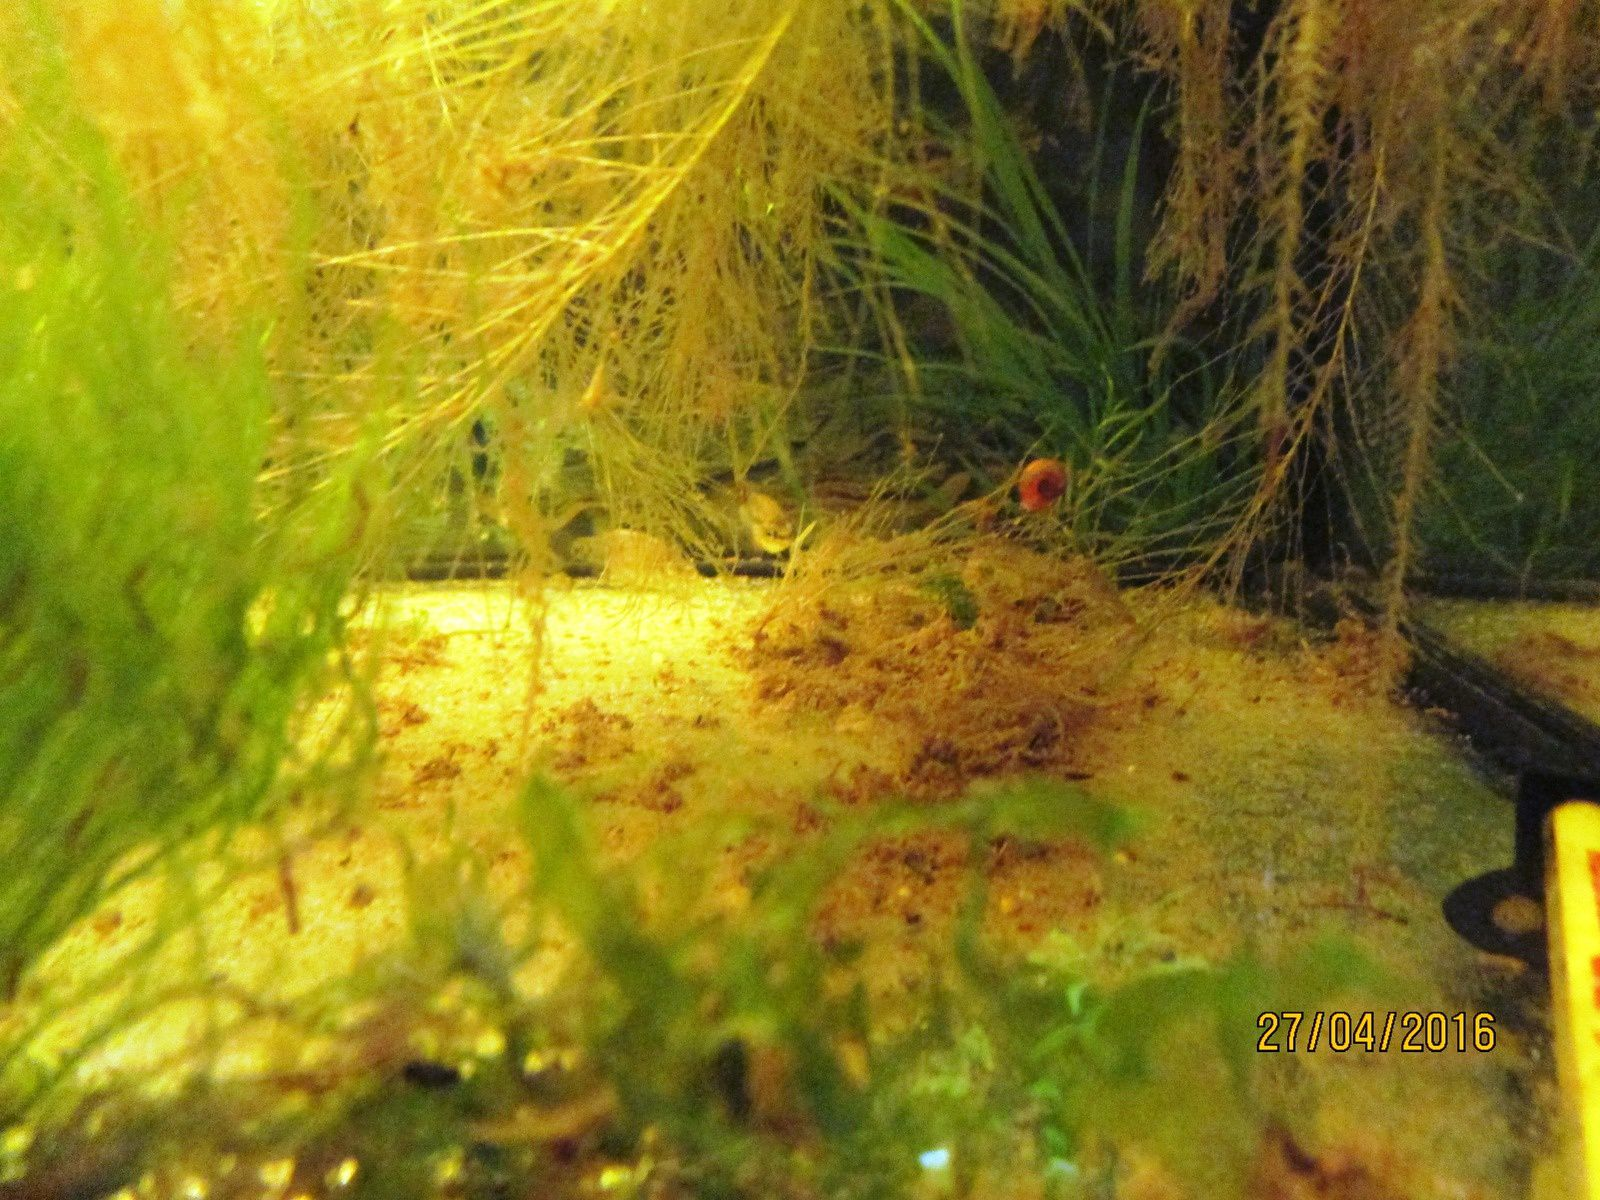 photos: Zoogoneticus tequila&#x3B; Zoogoneticus purhepechus à l'abri des regards&#x3B; Sturisoma aureum&#x3B; Pistia stratiotes, Salvinia natans, Vesicularia dubyana, Fontinalis antipyeretica, Riccia fluitans et Azolla filiculoides à la surface du bac des Zoogoneticus purhepechus.